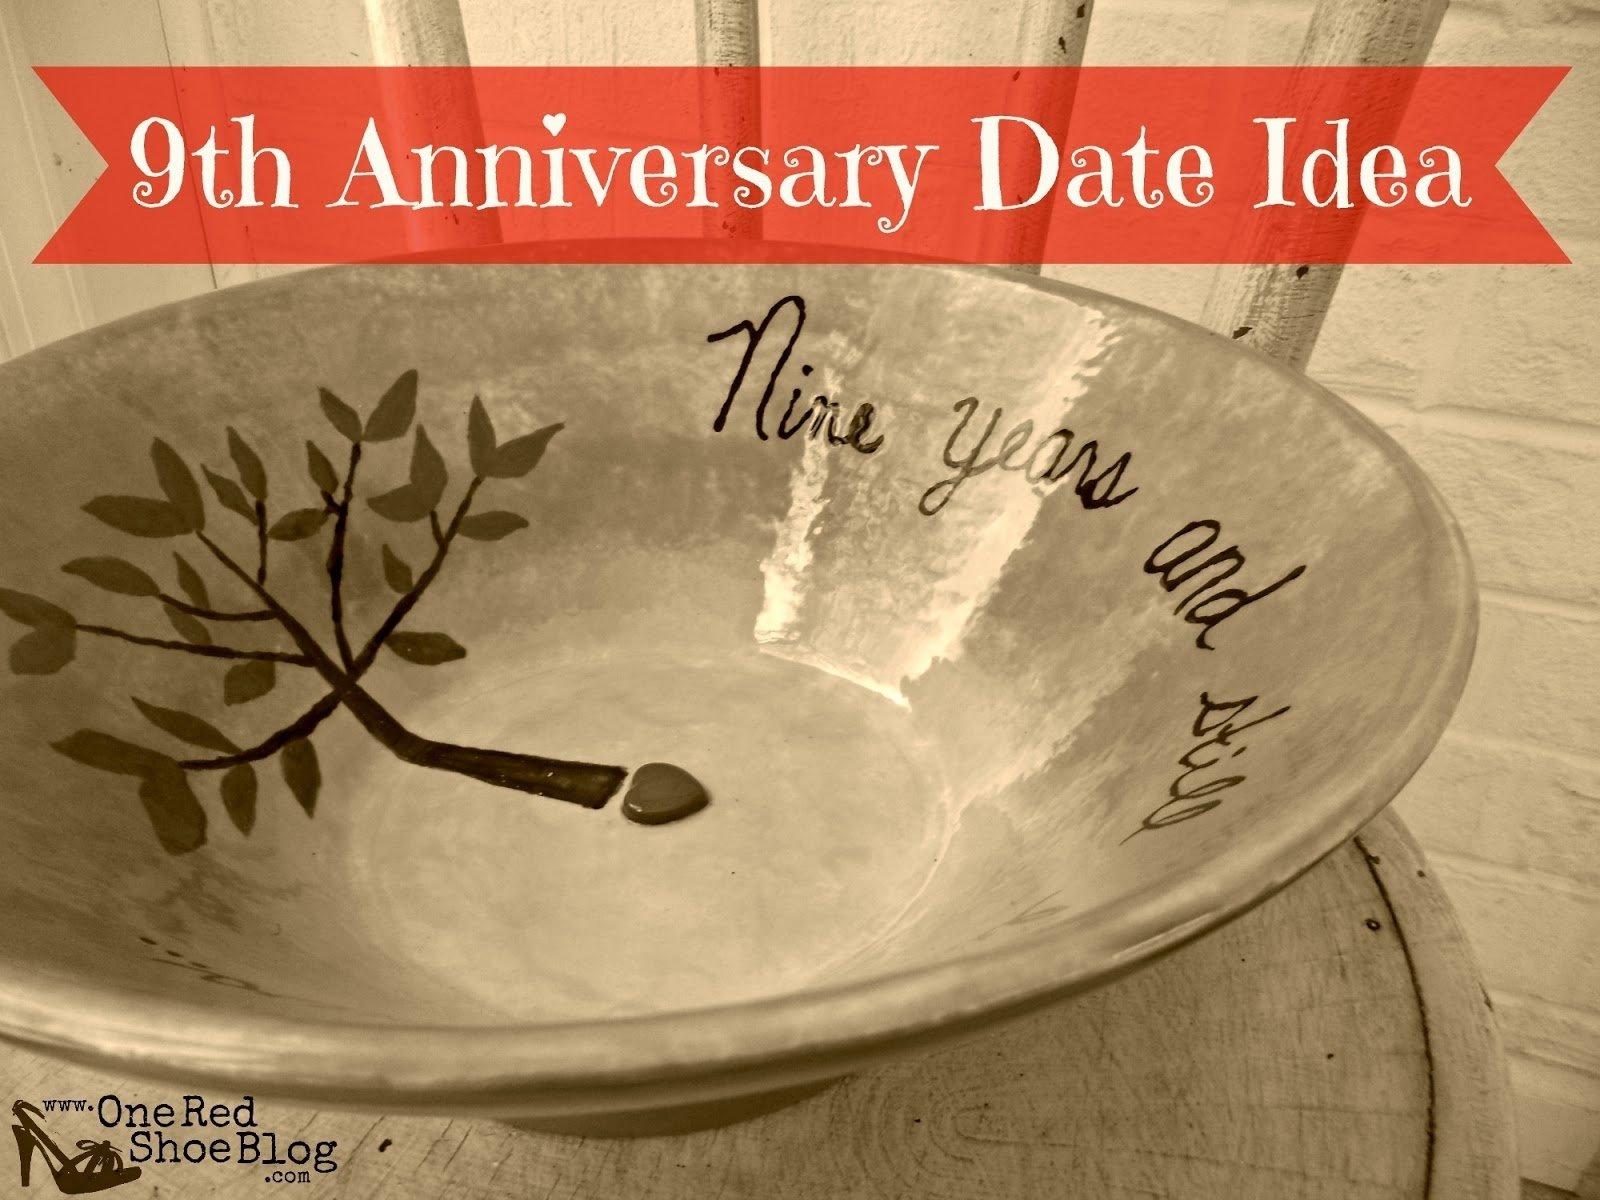 9th anniversary - pottery (idea for anniversary date night